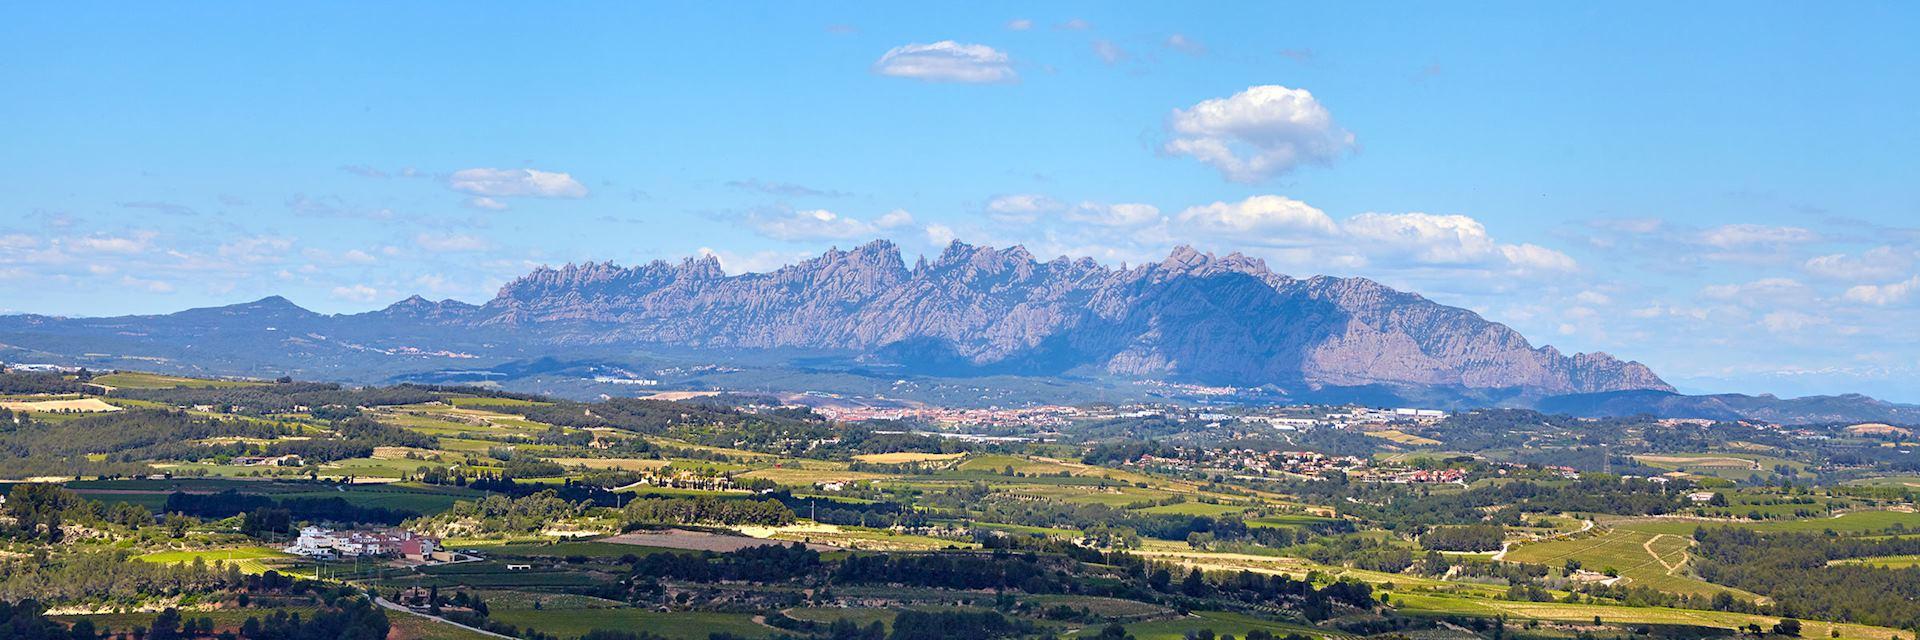 Vineyard, Montserrat